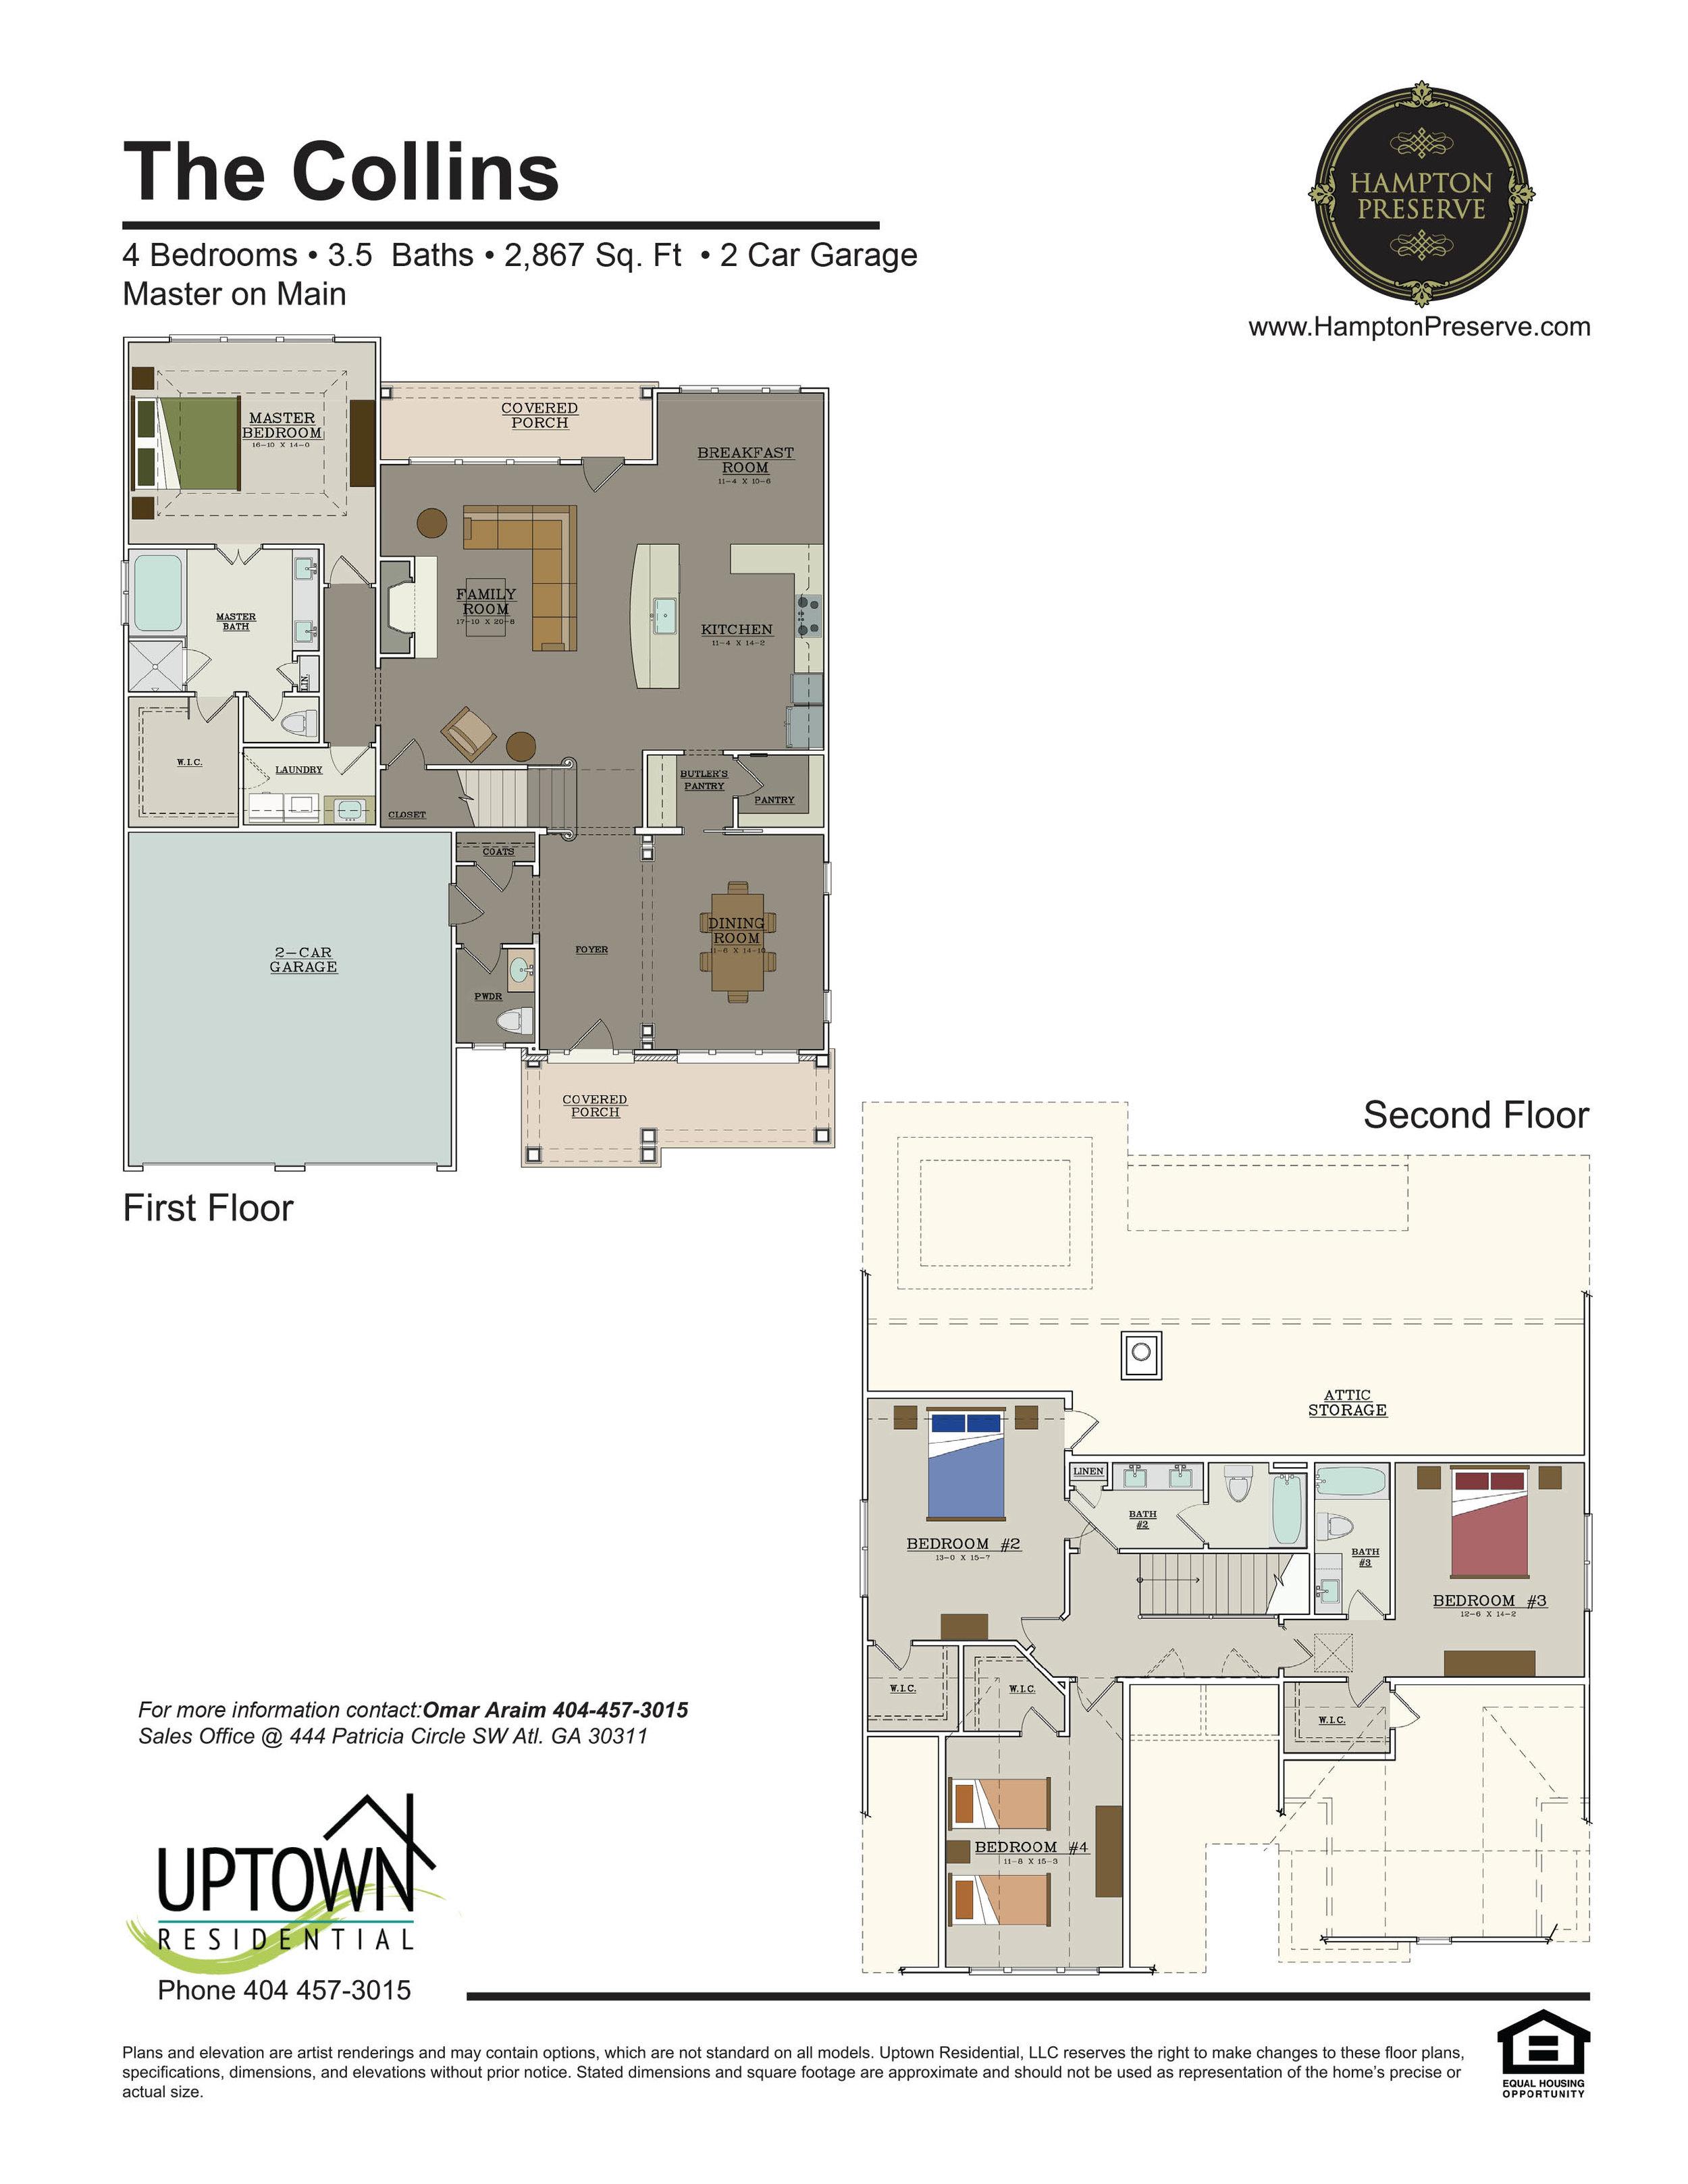 21669 Uptown Residential - Collins 2.jpg